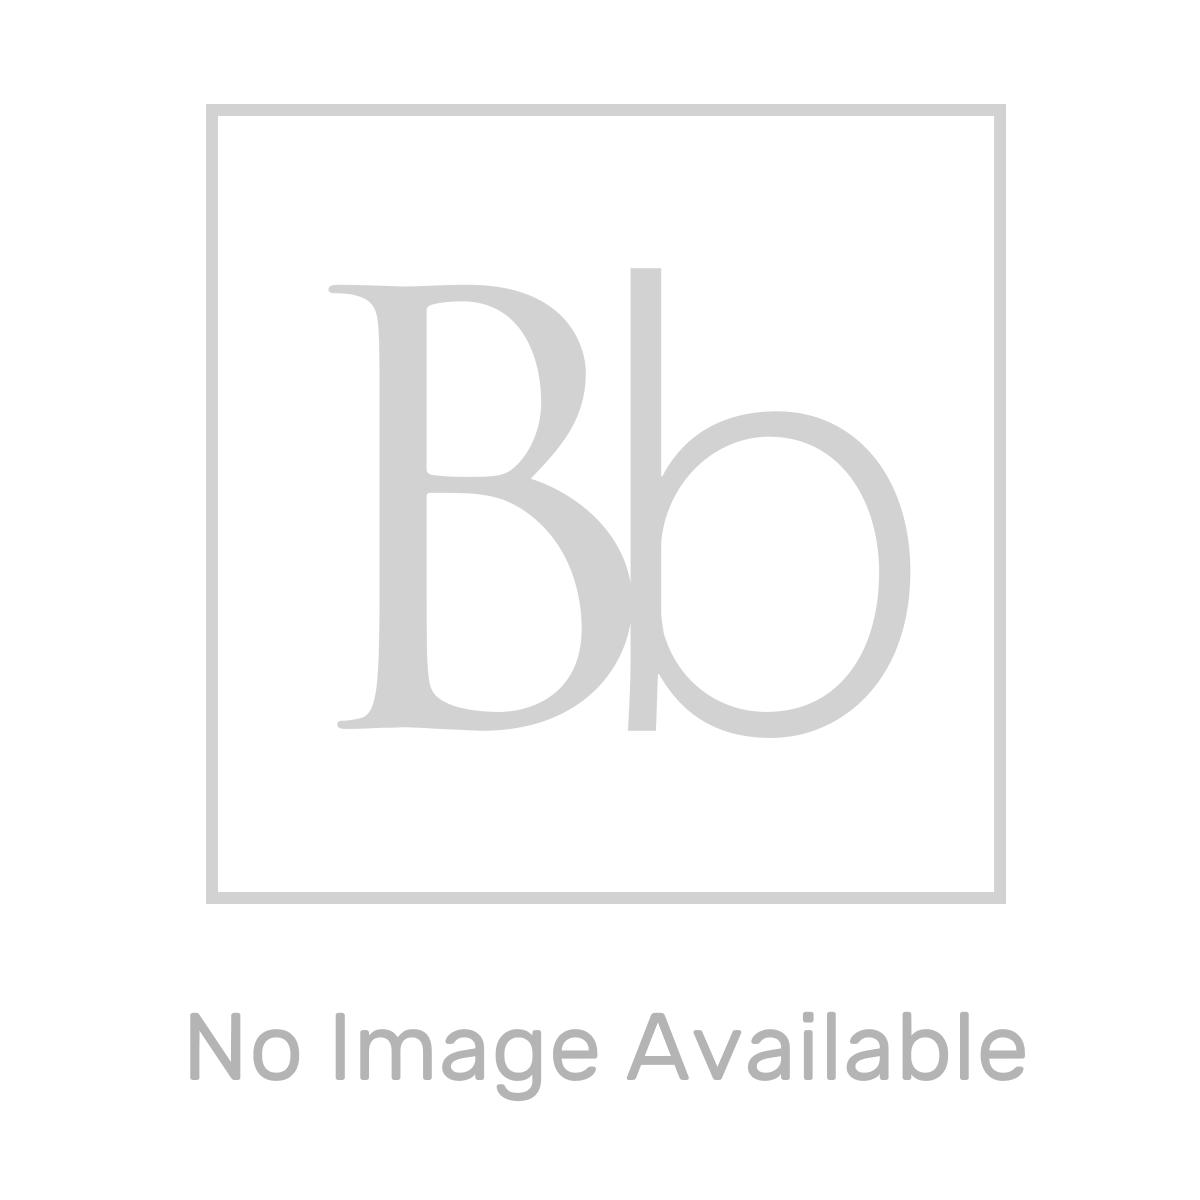 HiB Epic Illuminated Bathroom Mirror